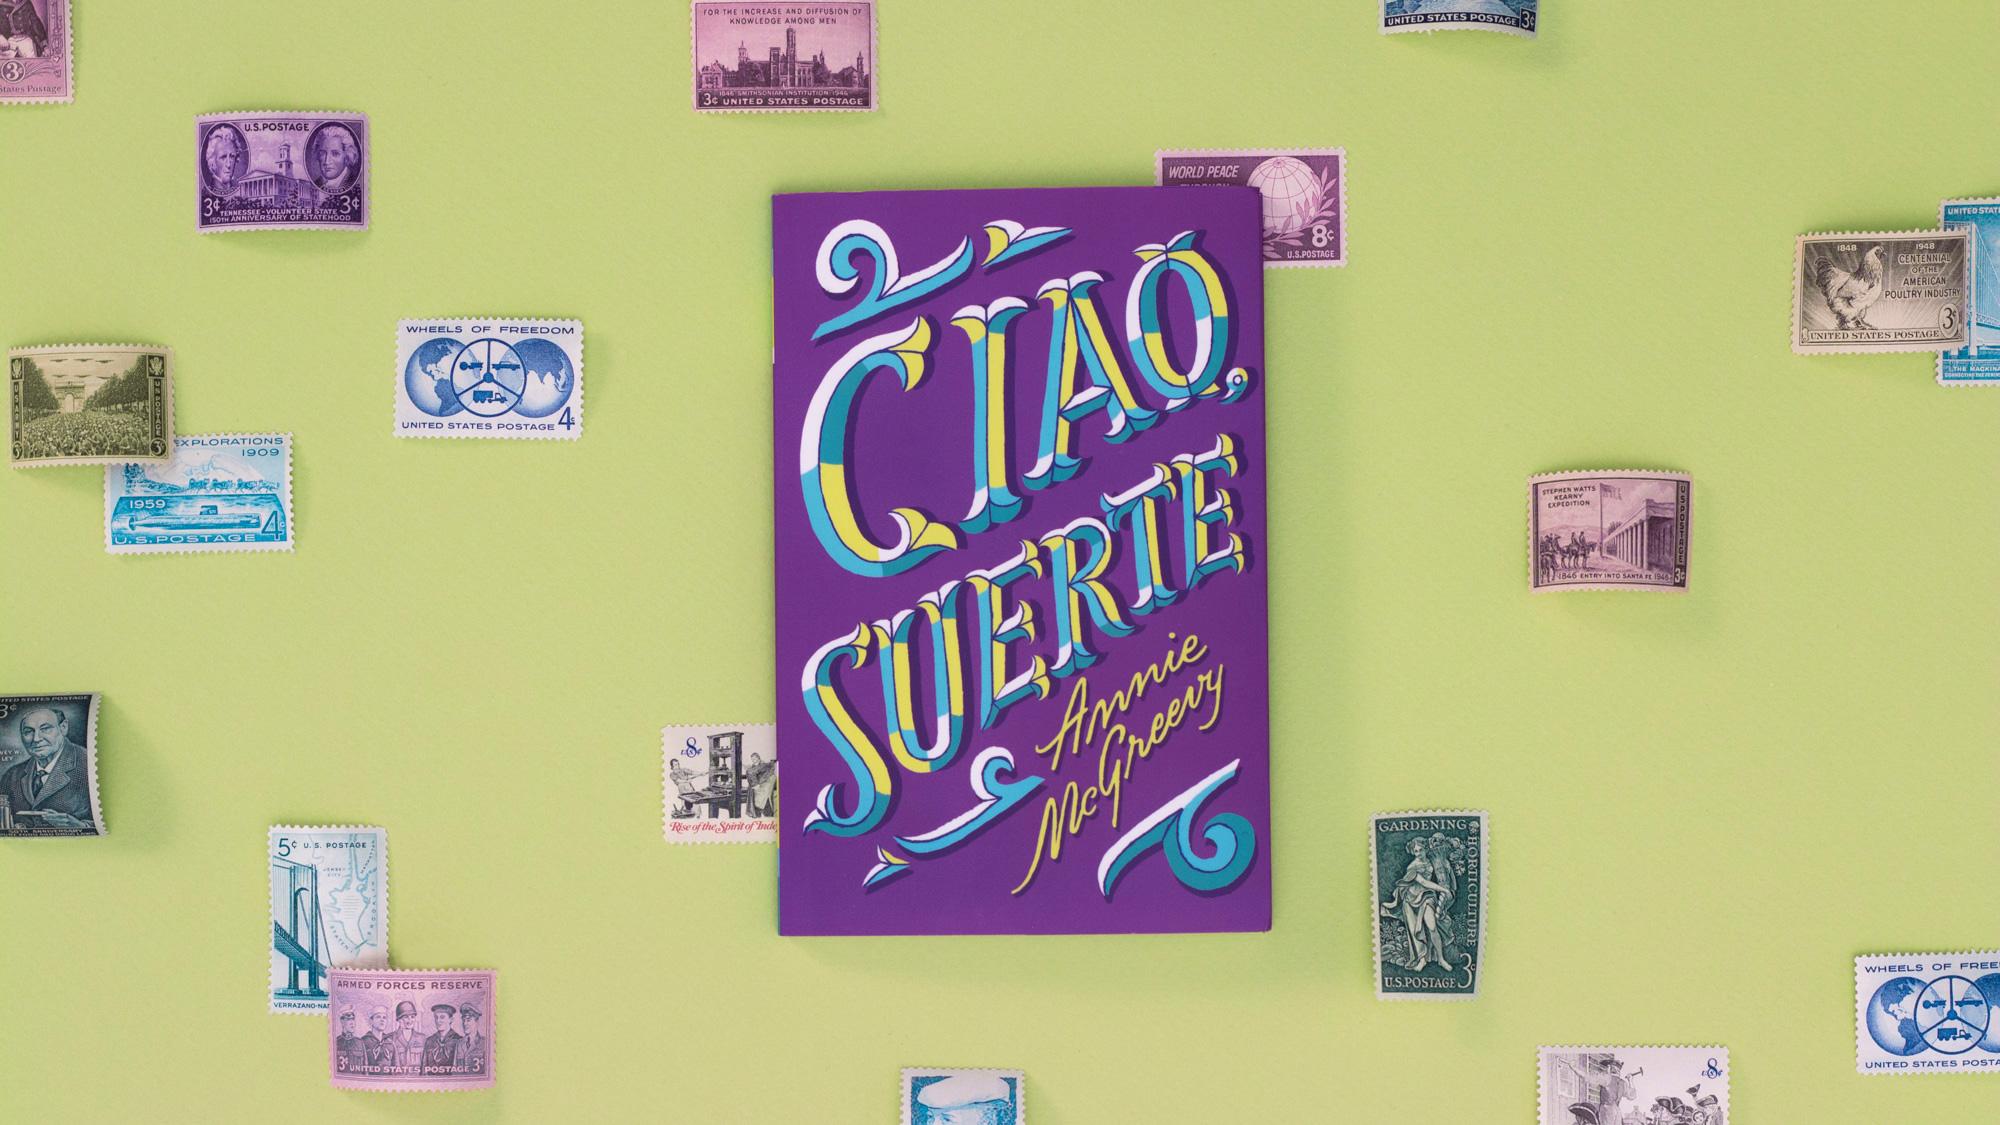 Isabel Urbina Peña book cover on Calligrafile